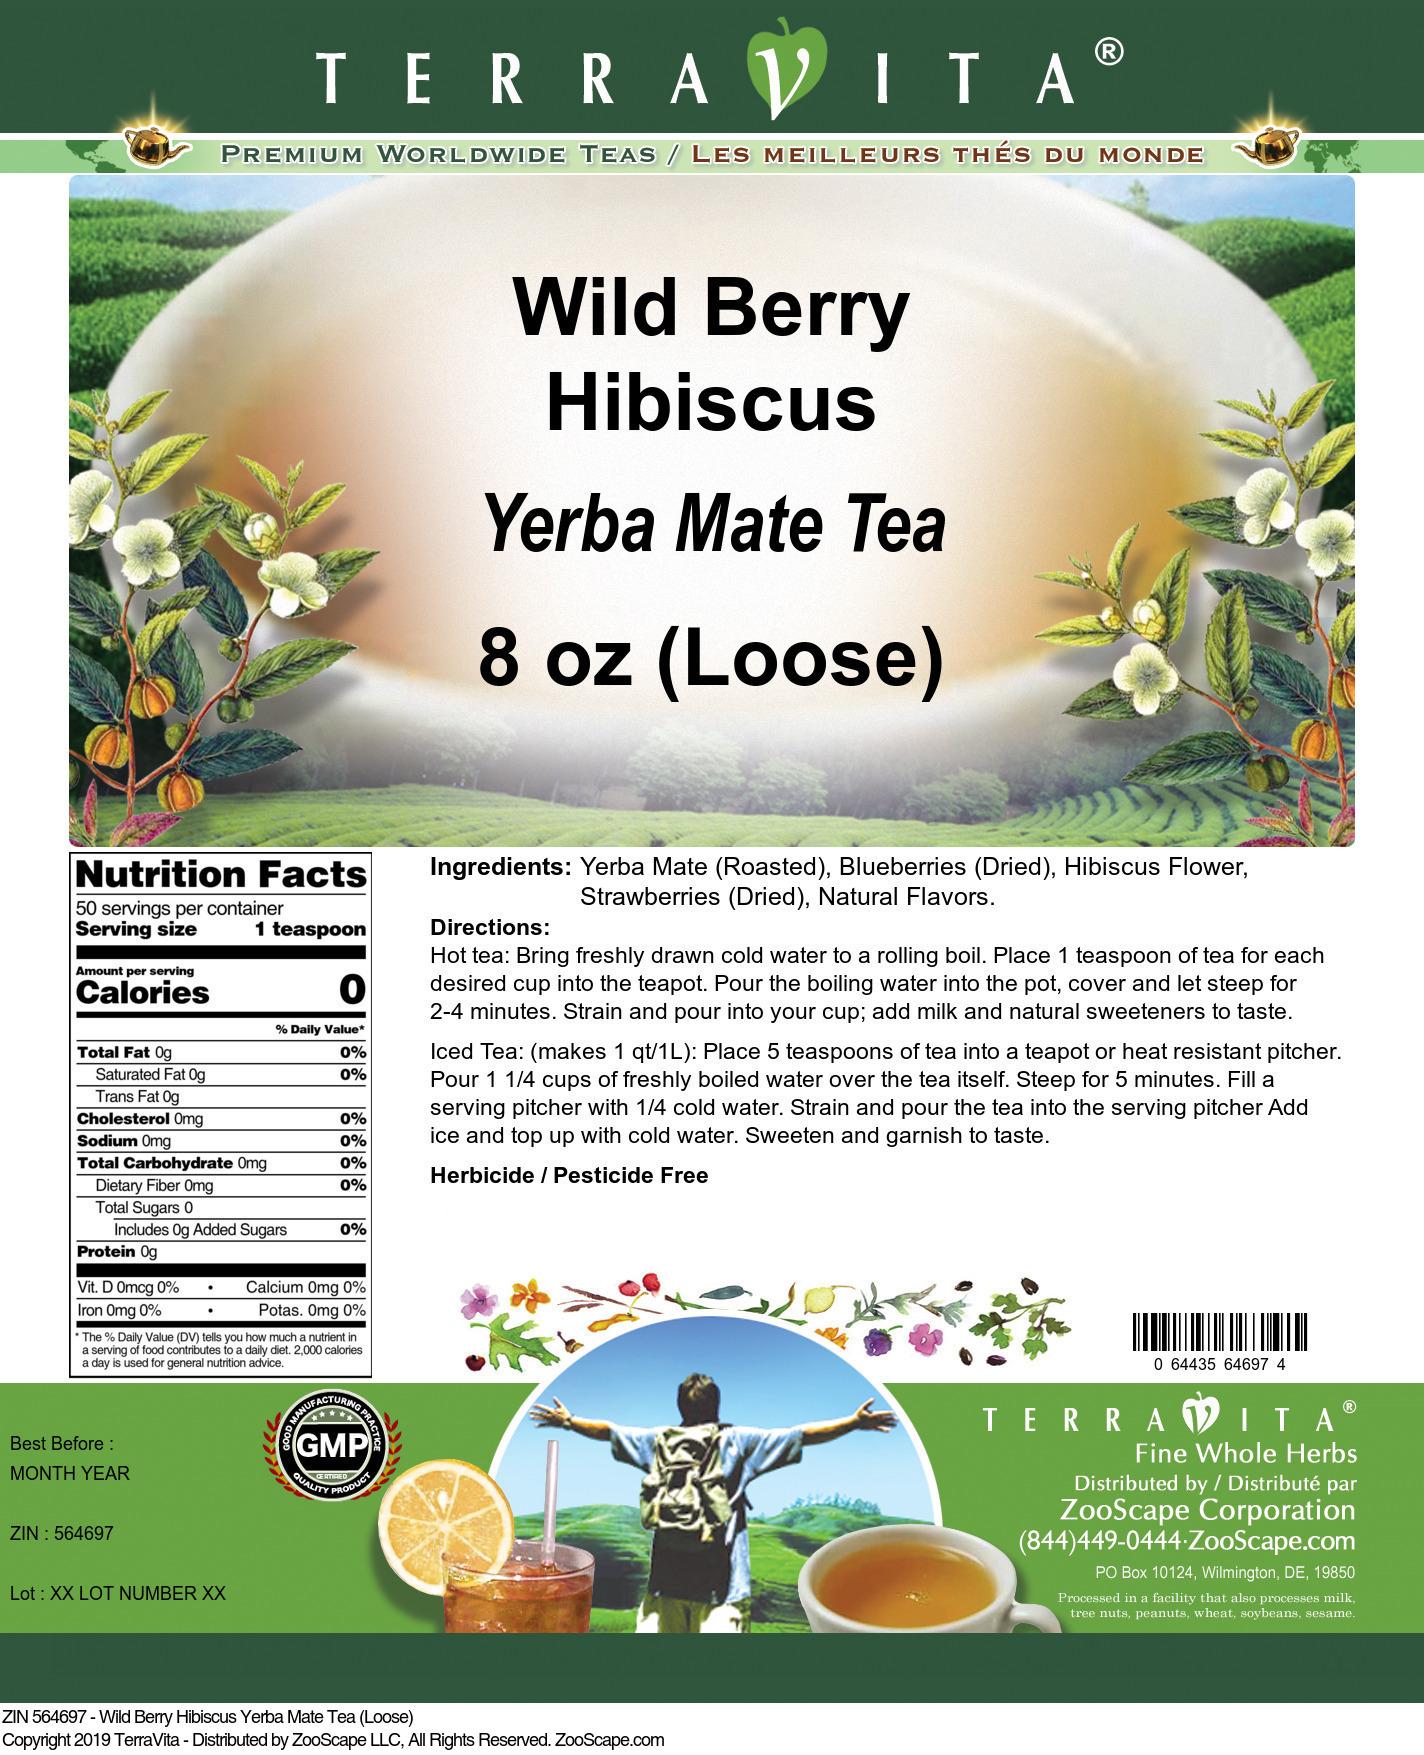 Wild Berry Hibiscus Yerba Mate Tea (Loose)